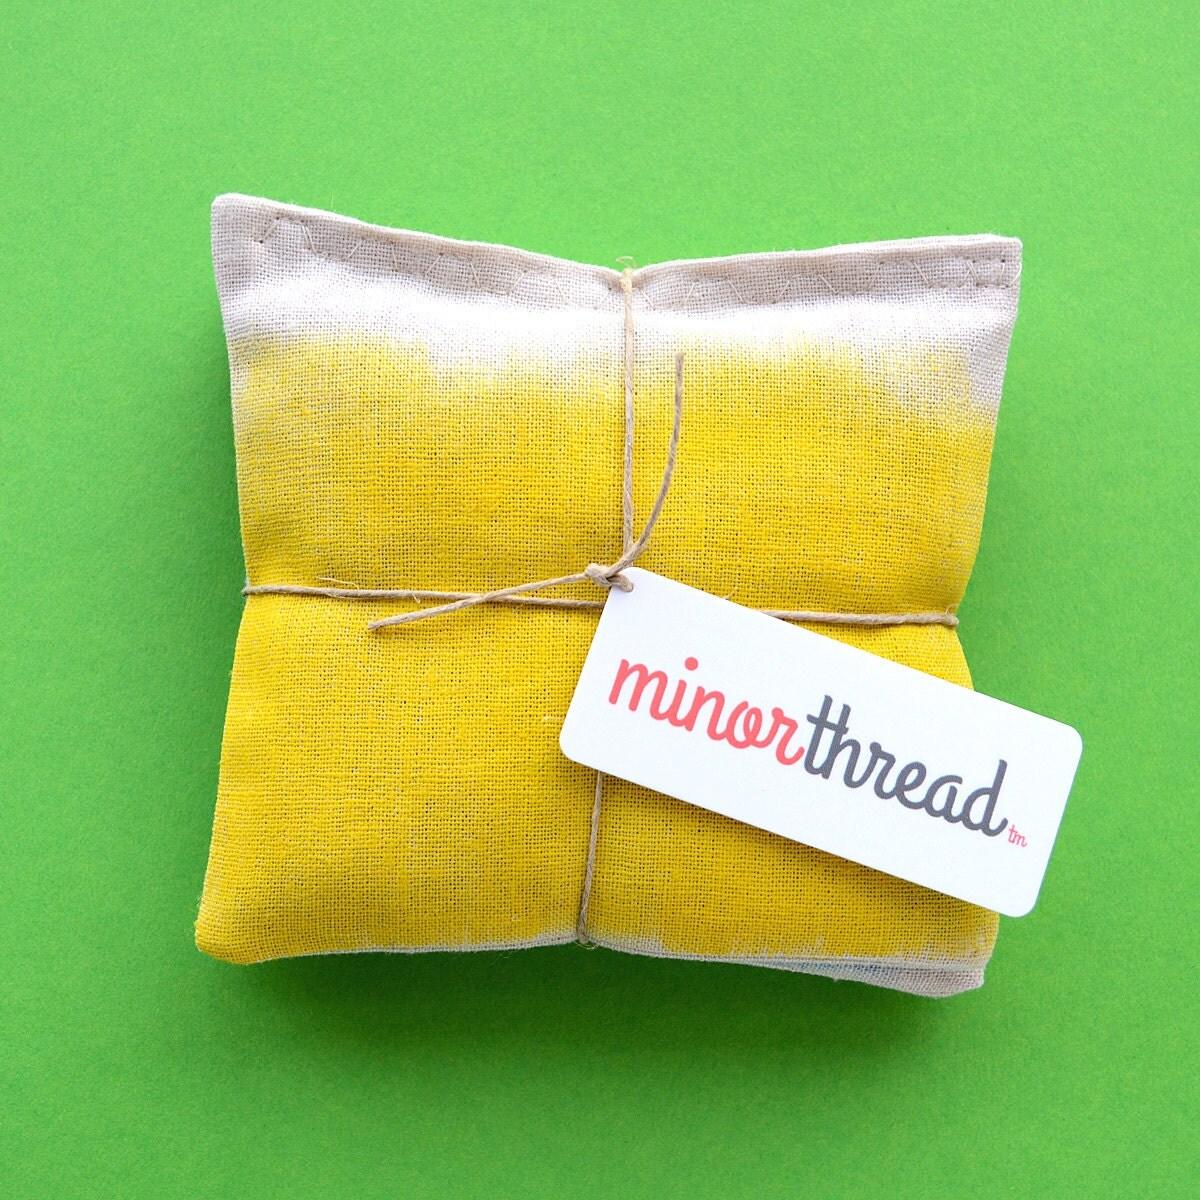 Minor Thread Tm Handmade Home Goods & Accessories By